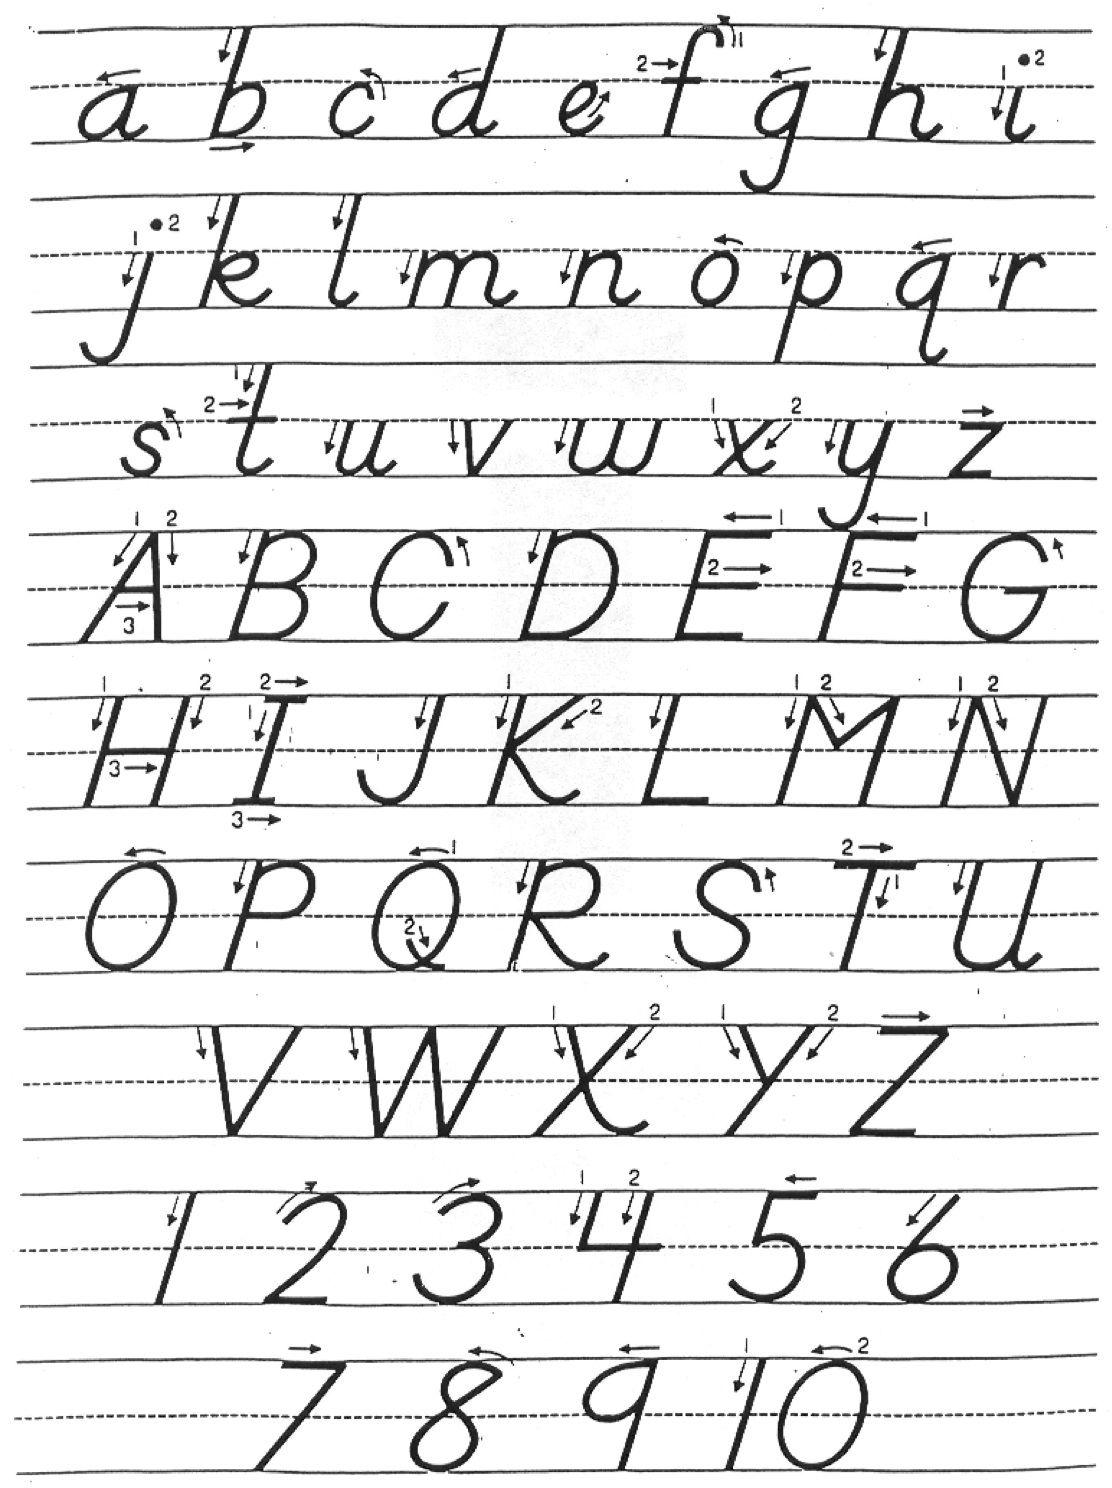 Uncategorized D Nealian Handwriting Worksheets dnealian handwriting canyon teaches not block my dnealian